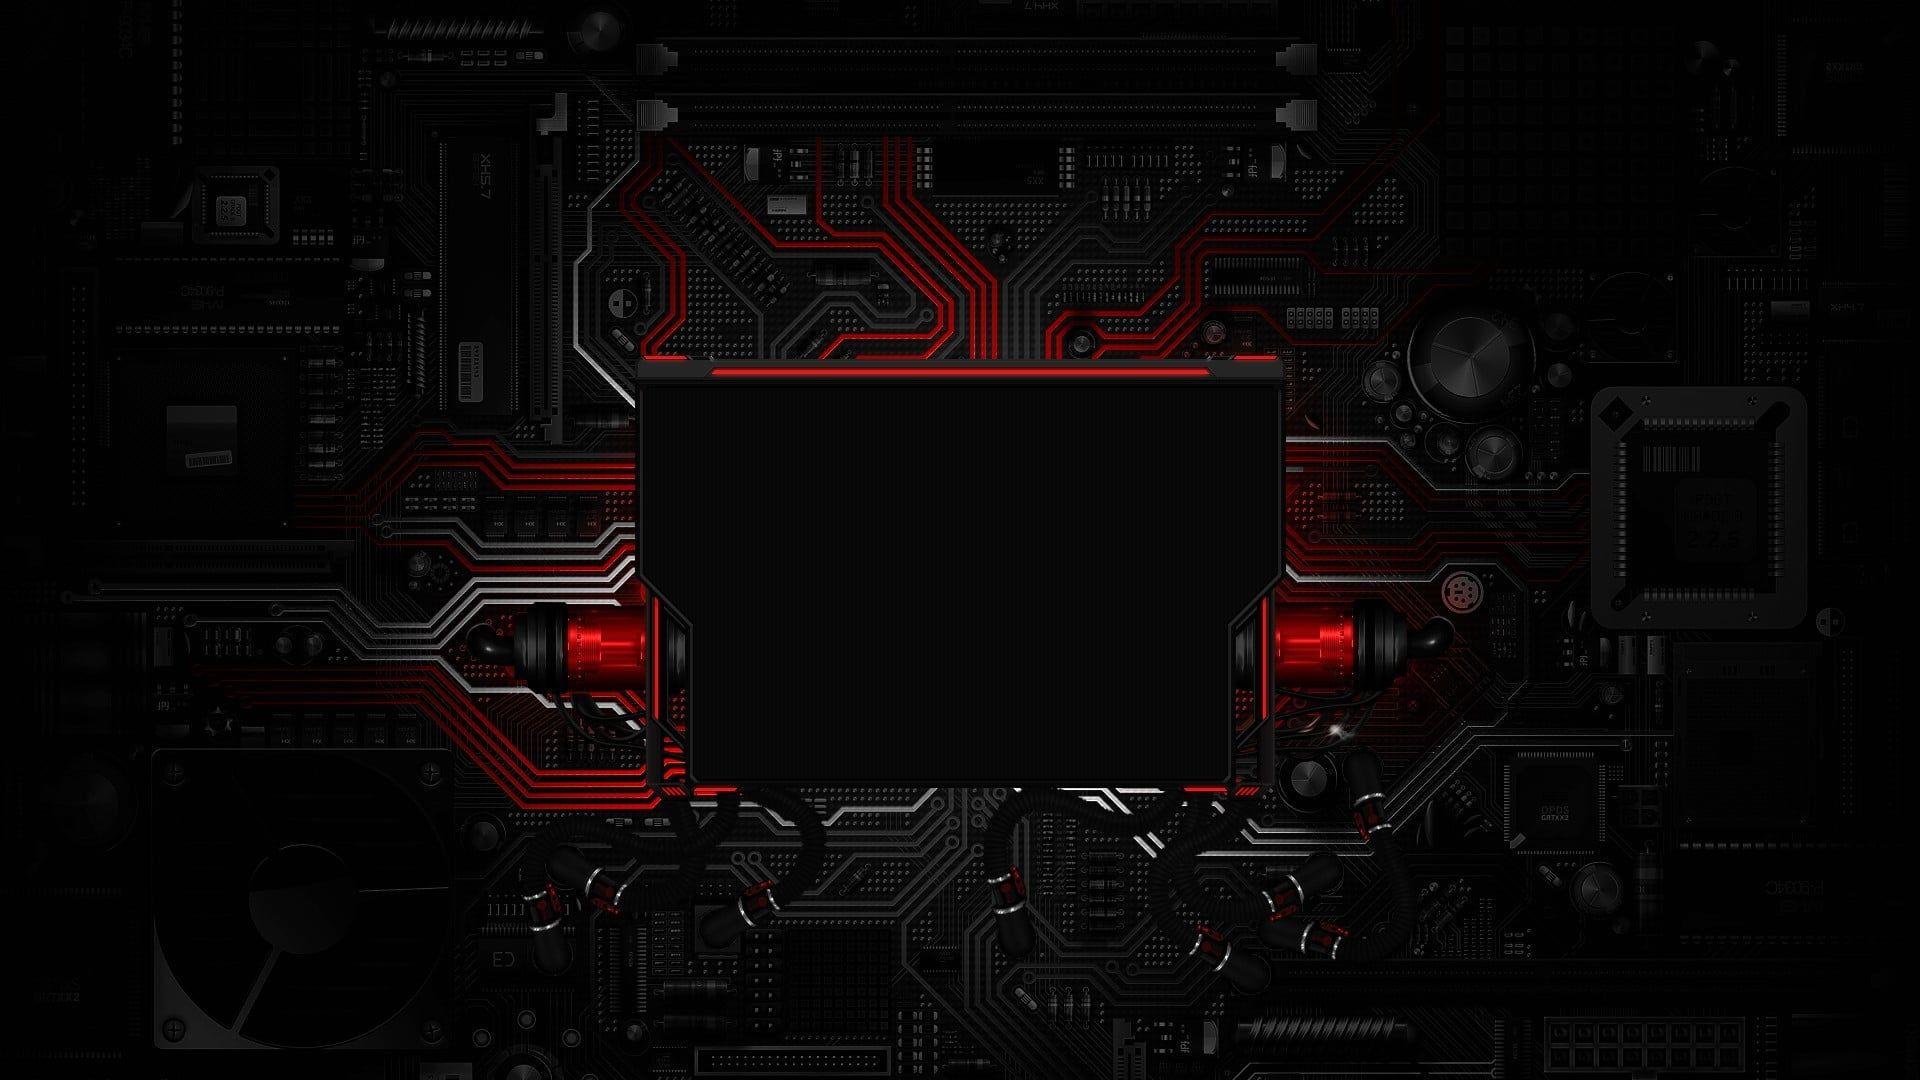 Wallpaper Red And Black Circuit Board Circuits Electronics Digital Art Technology Wallpaper Hi Tech Wallpaper Hd Wallpaper Desktop